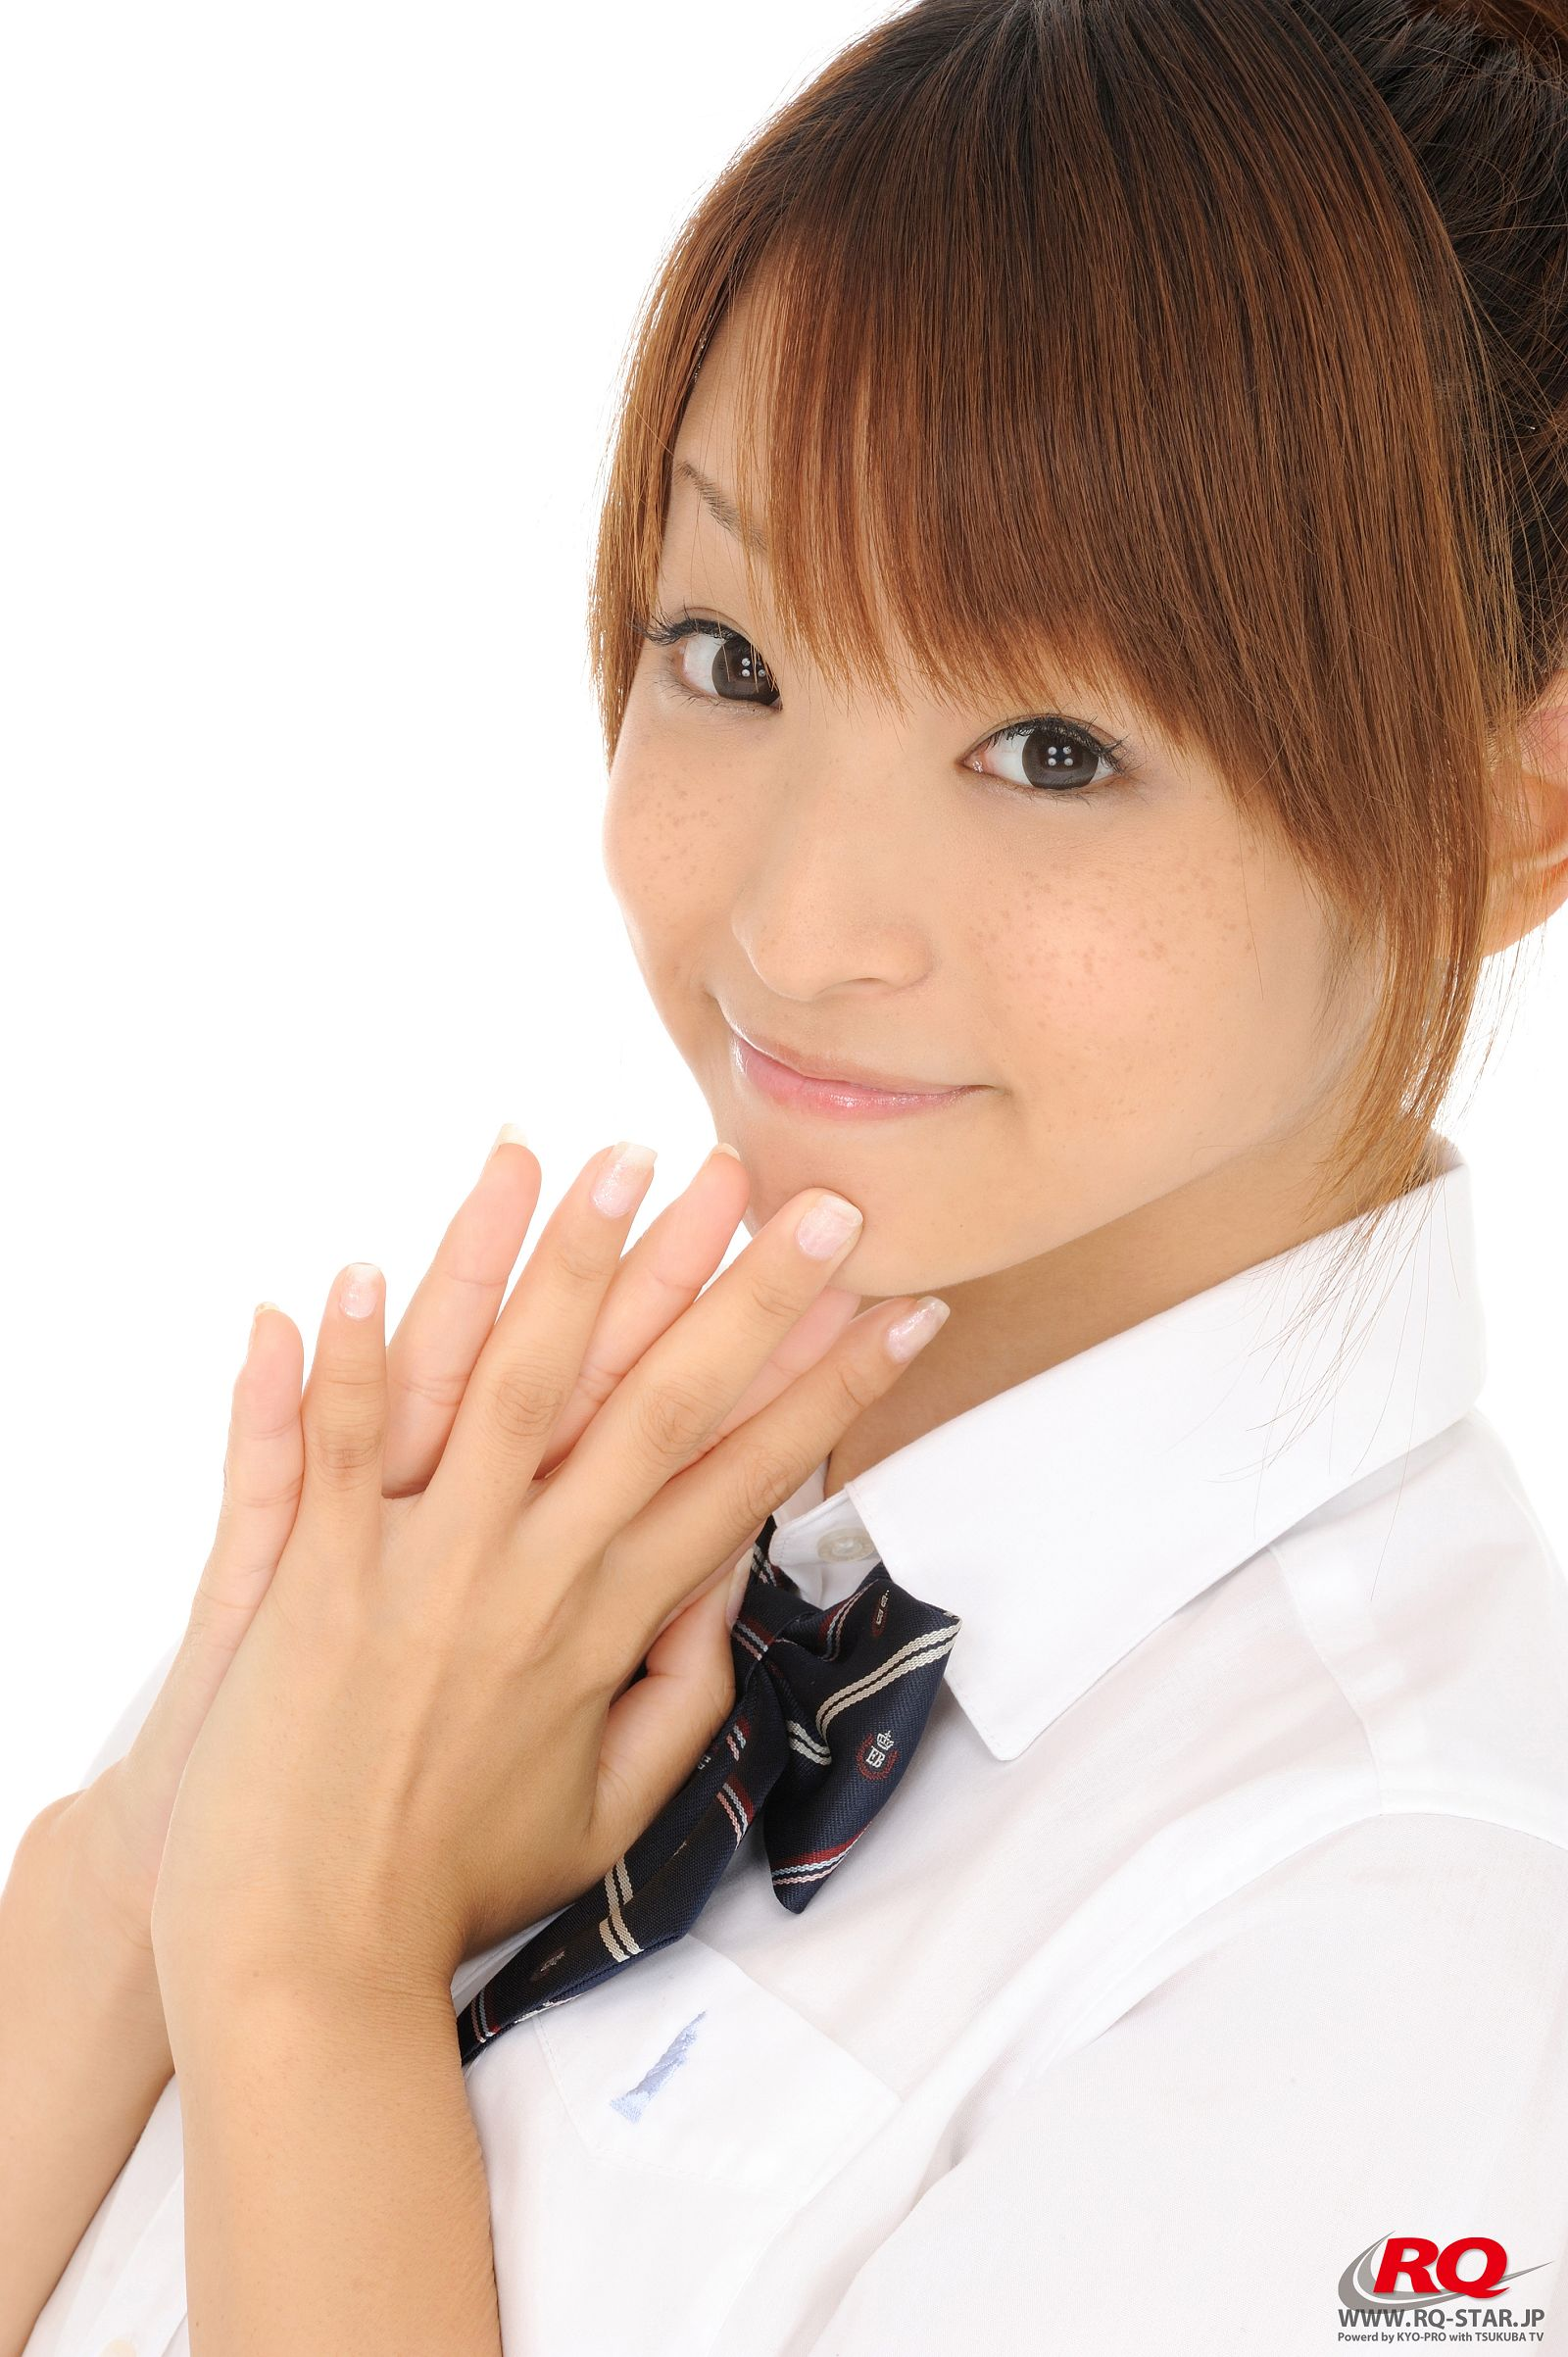 [RQ STAR美女] NO.01152 Mio Aoki 青木未央 Student Style[50P] RQ STAR 第2张